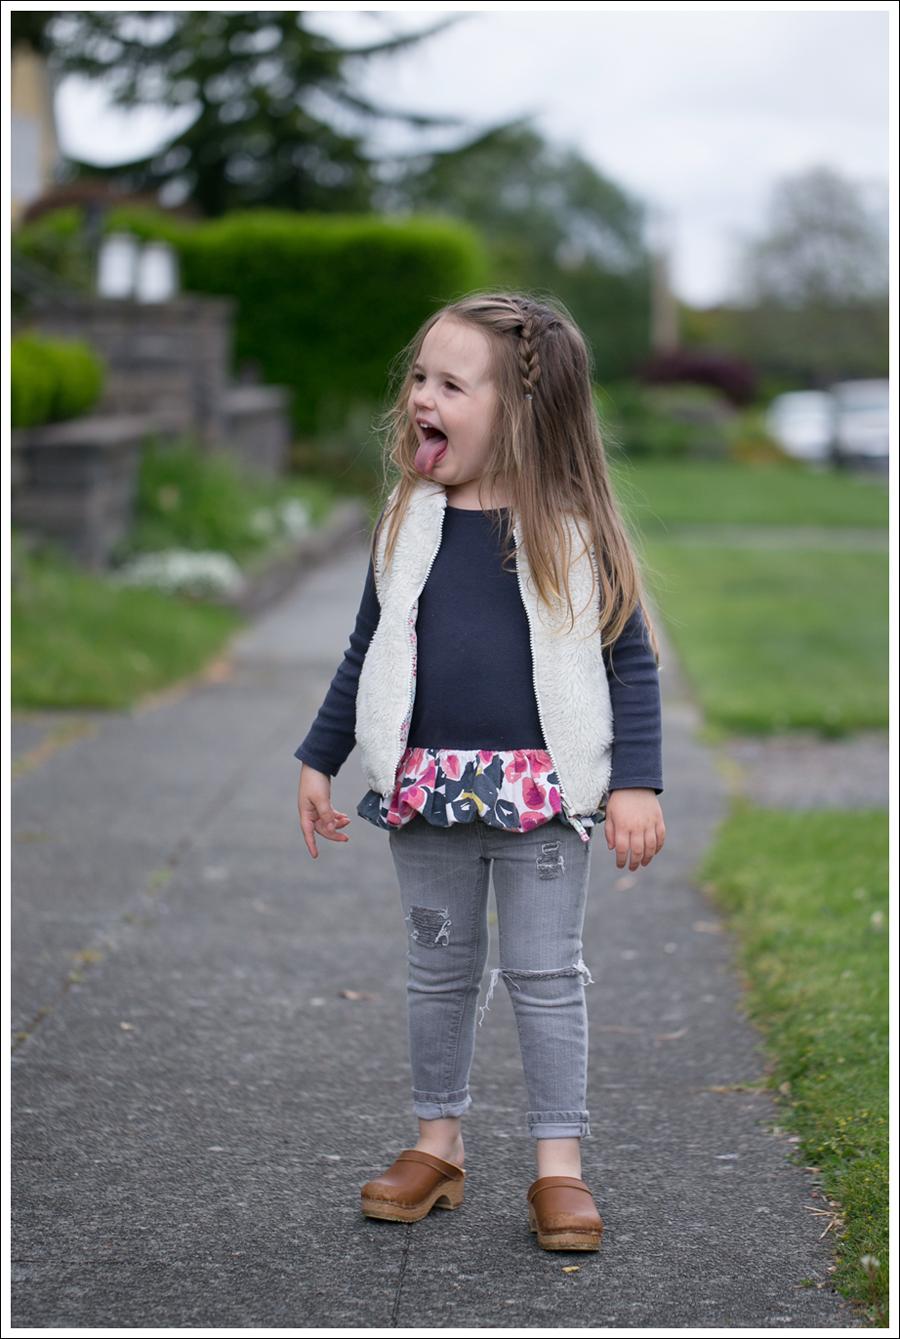 Blog GapKids Faux Fur Reversible Vest Tea Collection Gray Floral Tunic Skinny Mini Destroyed Gray Jeans Sven Clogs-11